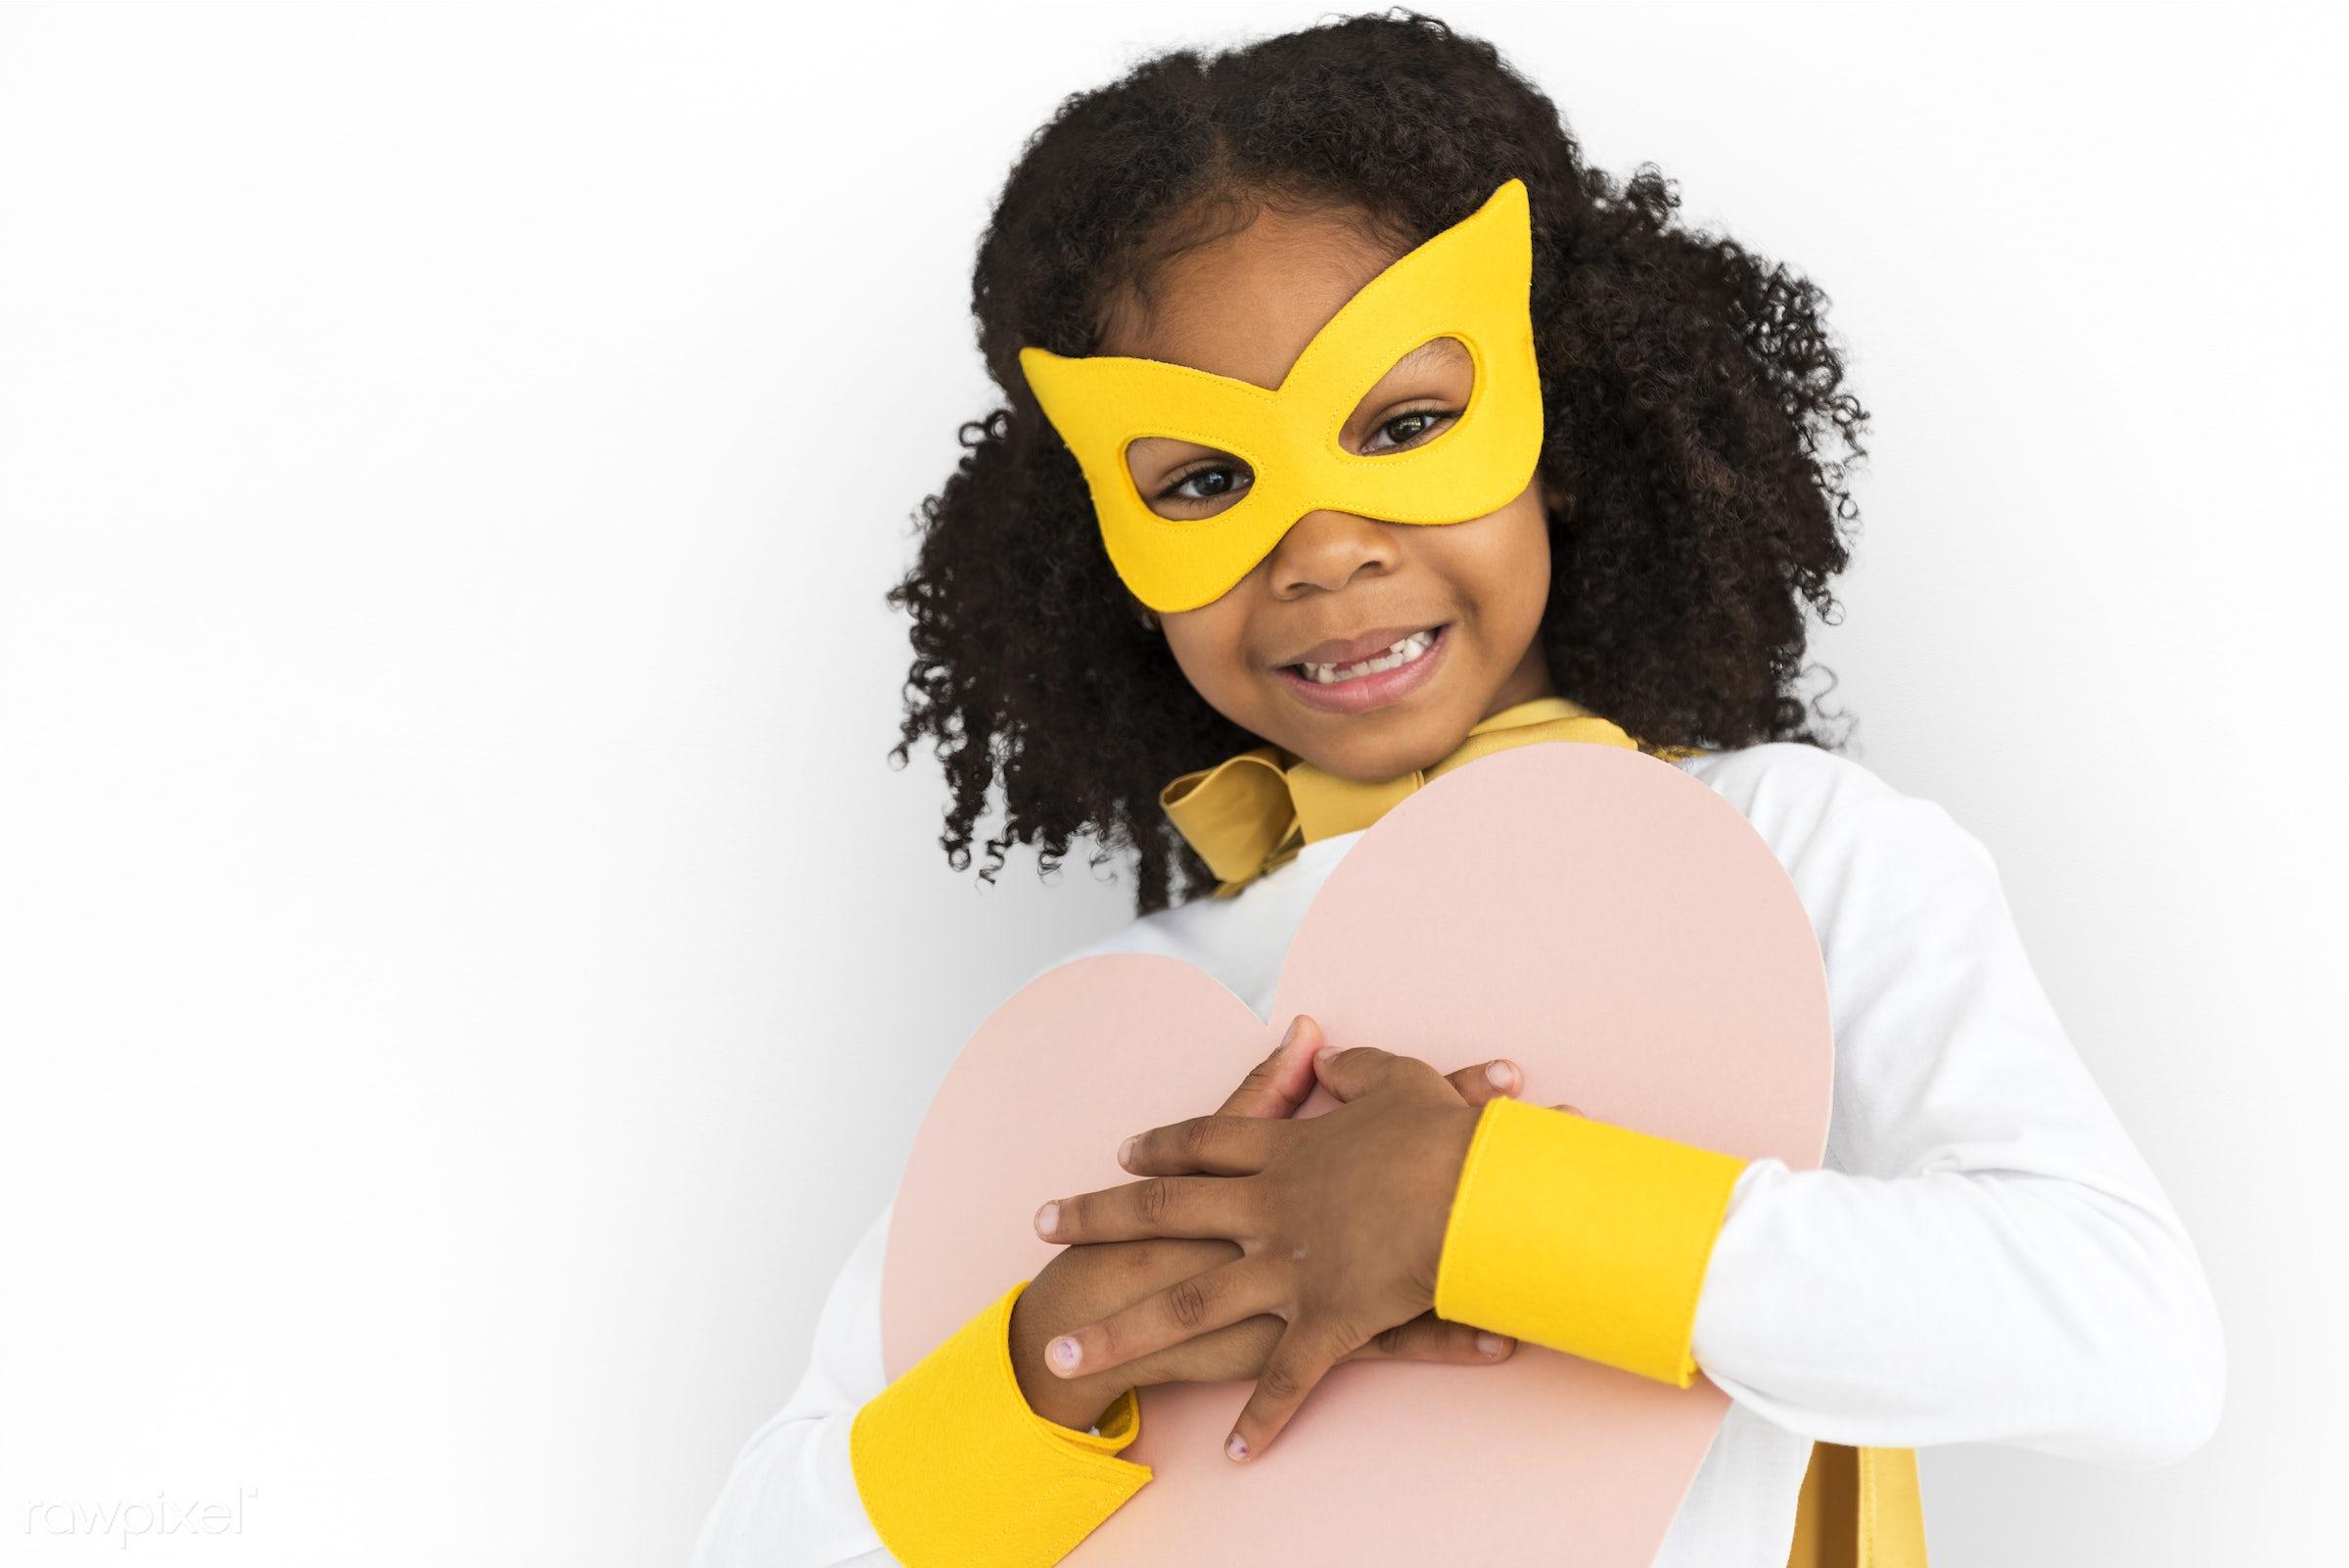 children, courageous, adolescence, kid, child, inspiration, girl, leader, idol, childhood, superhero, isolated, hero, heart...